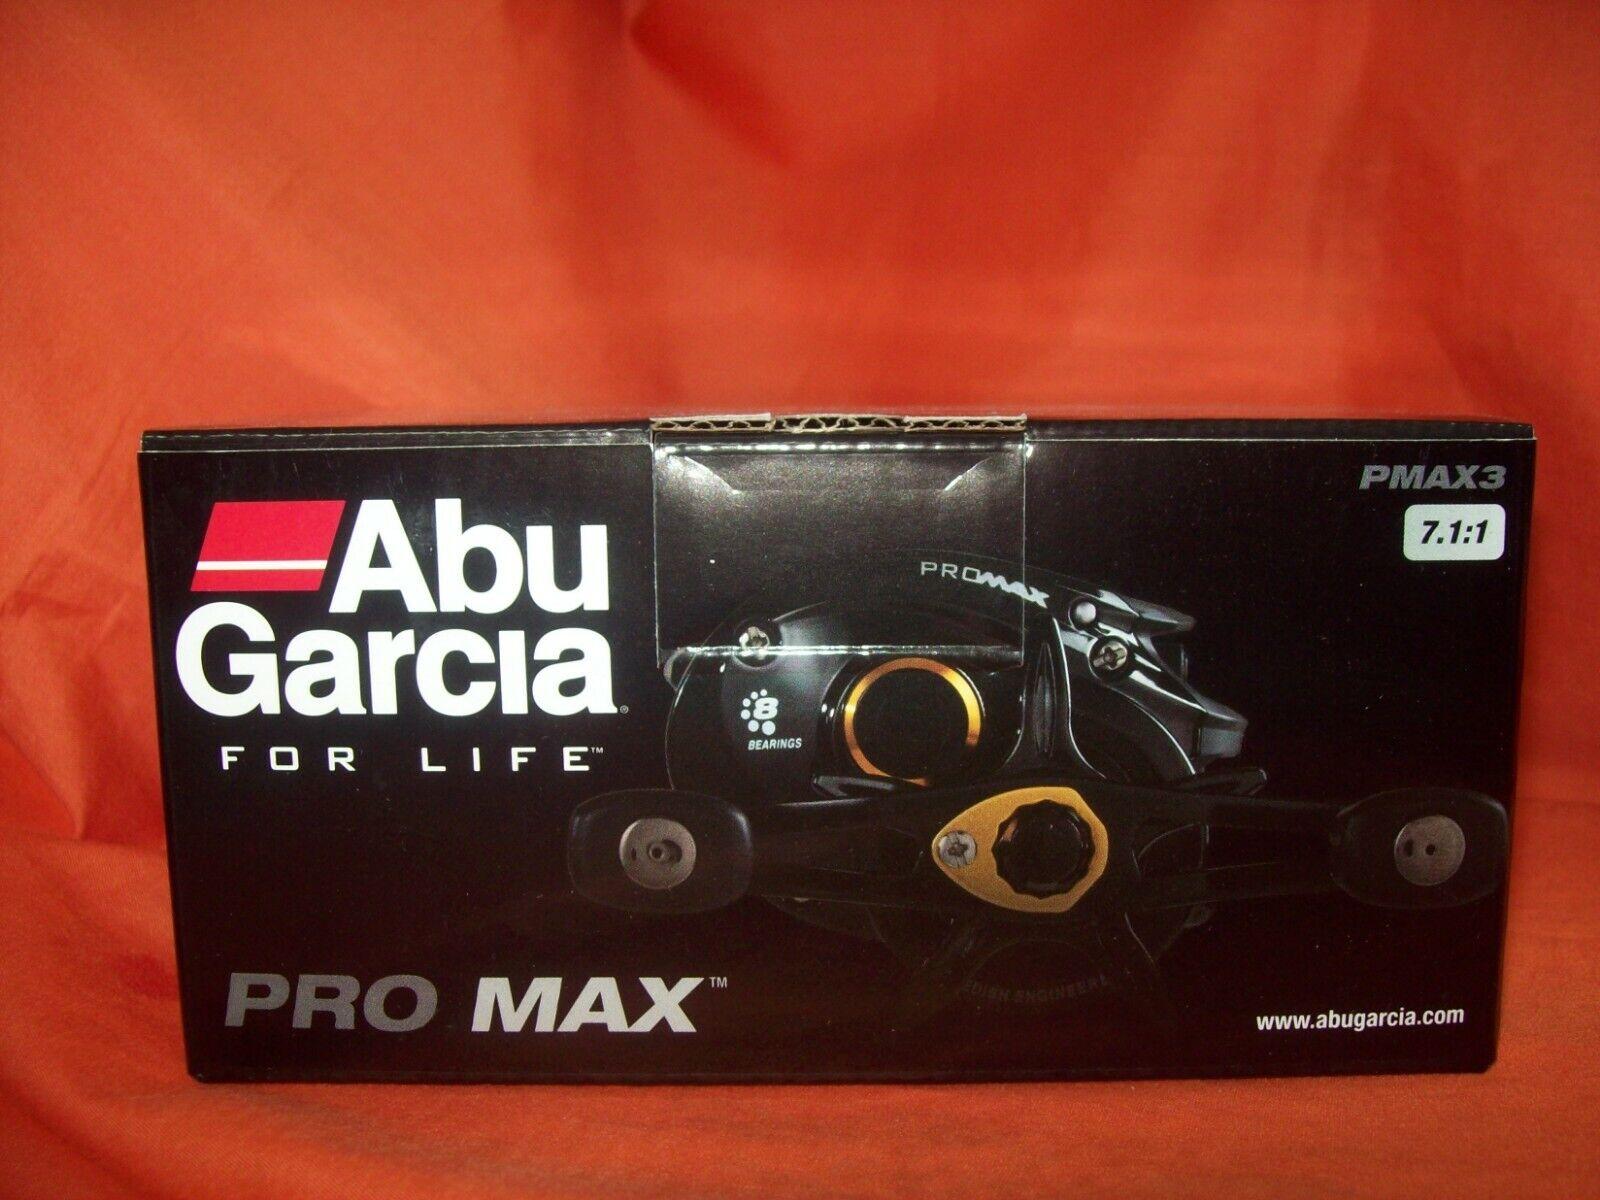 ABU GARCIA PRO MAX 7.1 1 GR PMAX3 RIGHT HANDED 1365359 BAITCASTER